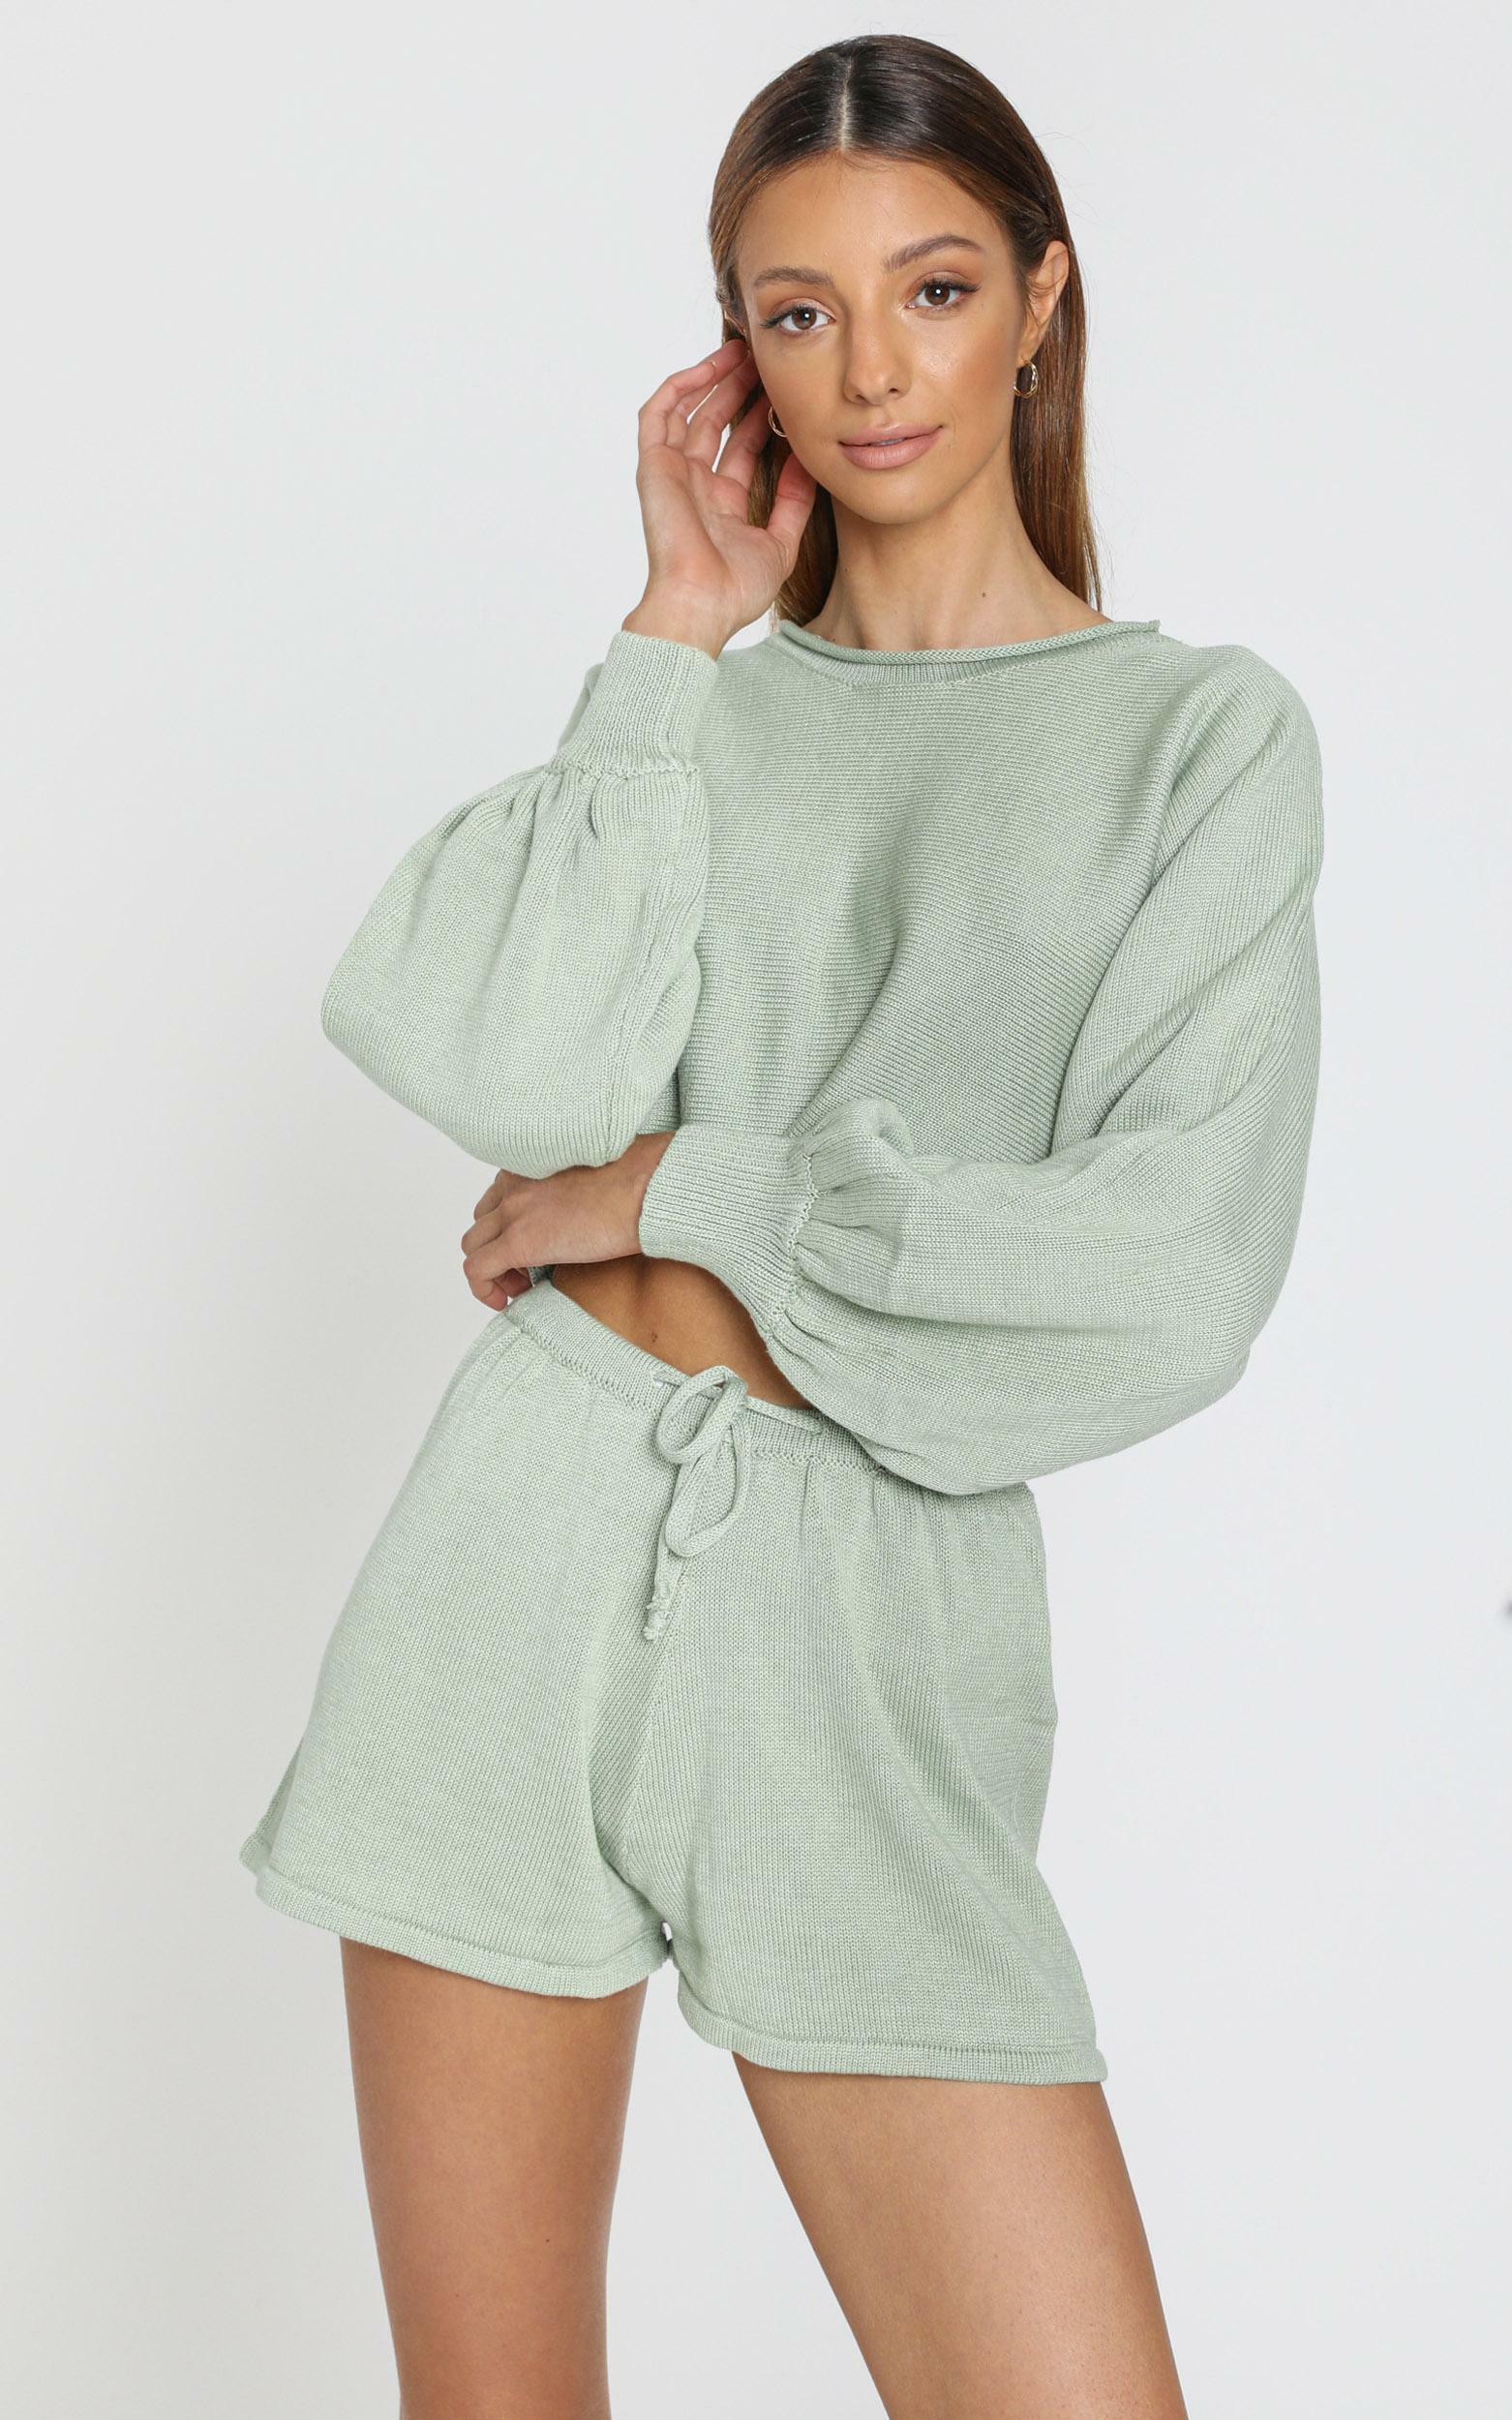 Hartley Knitted Shorts in Sage, Sage, hi-res image number null